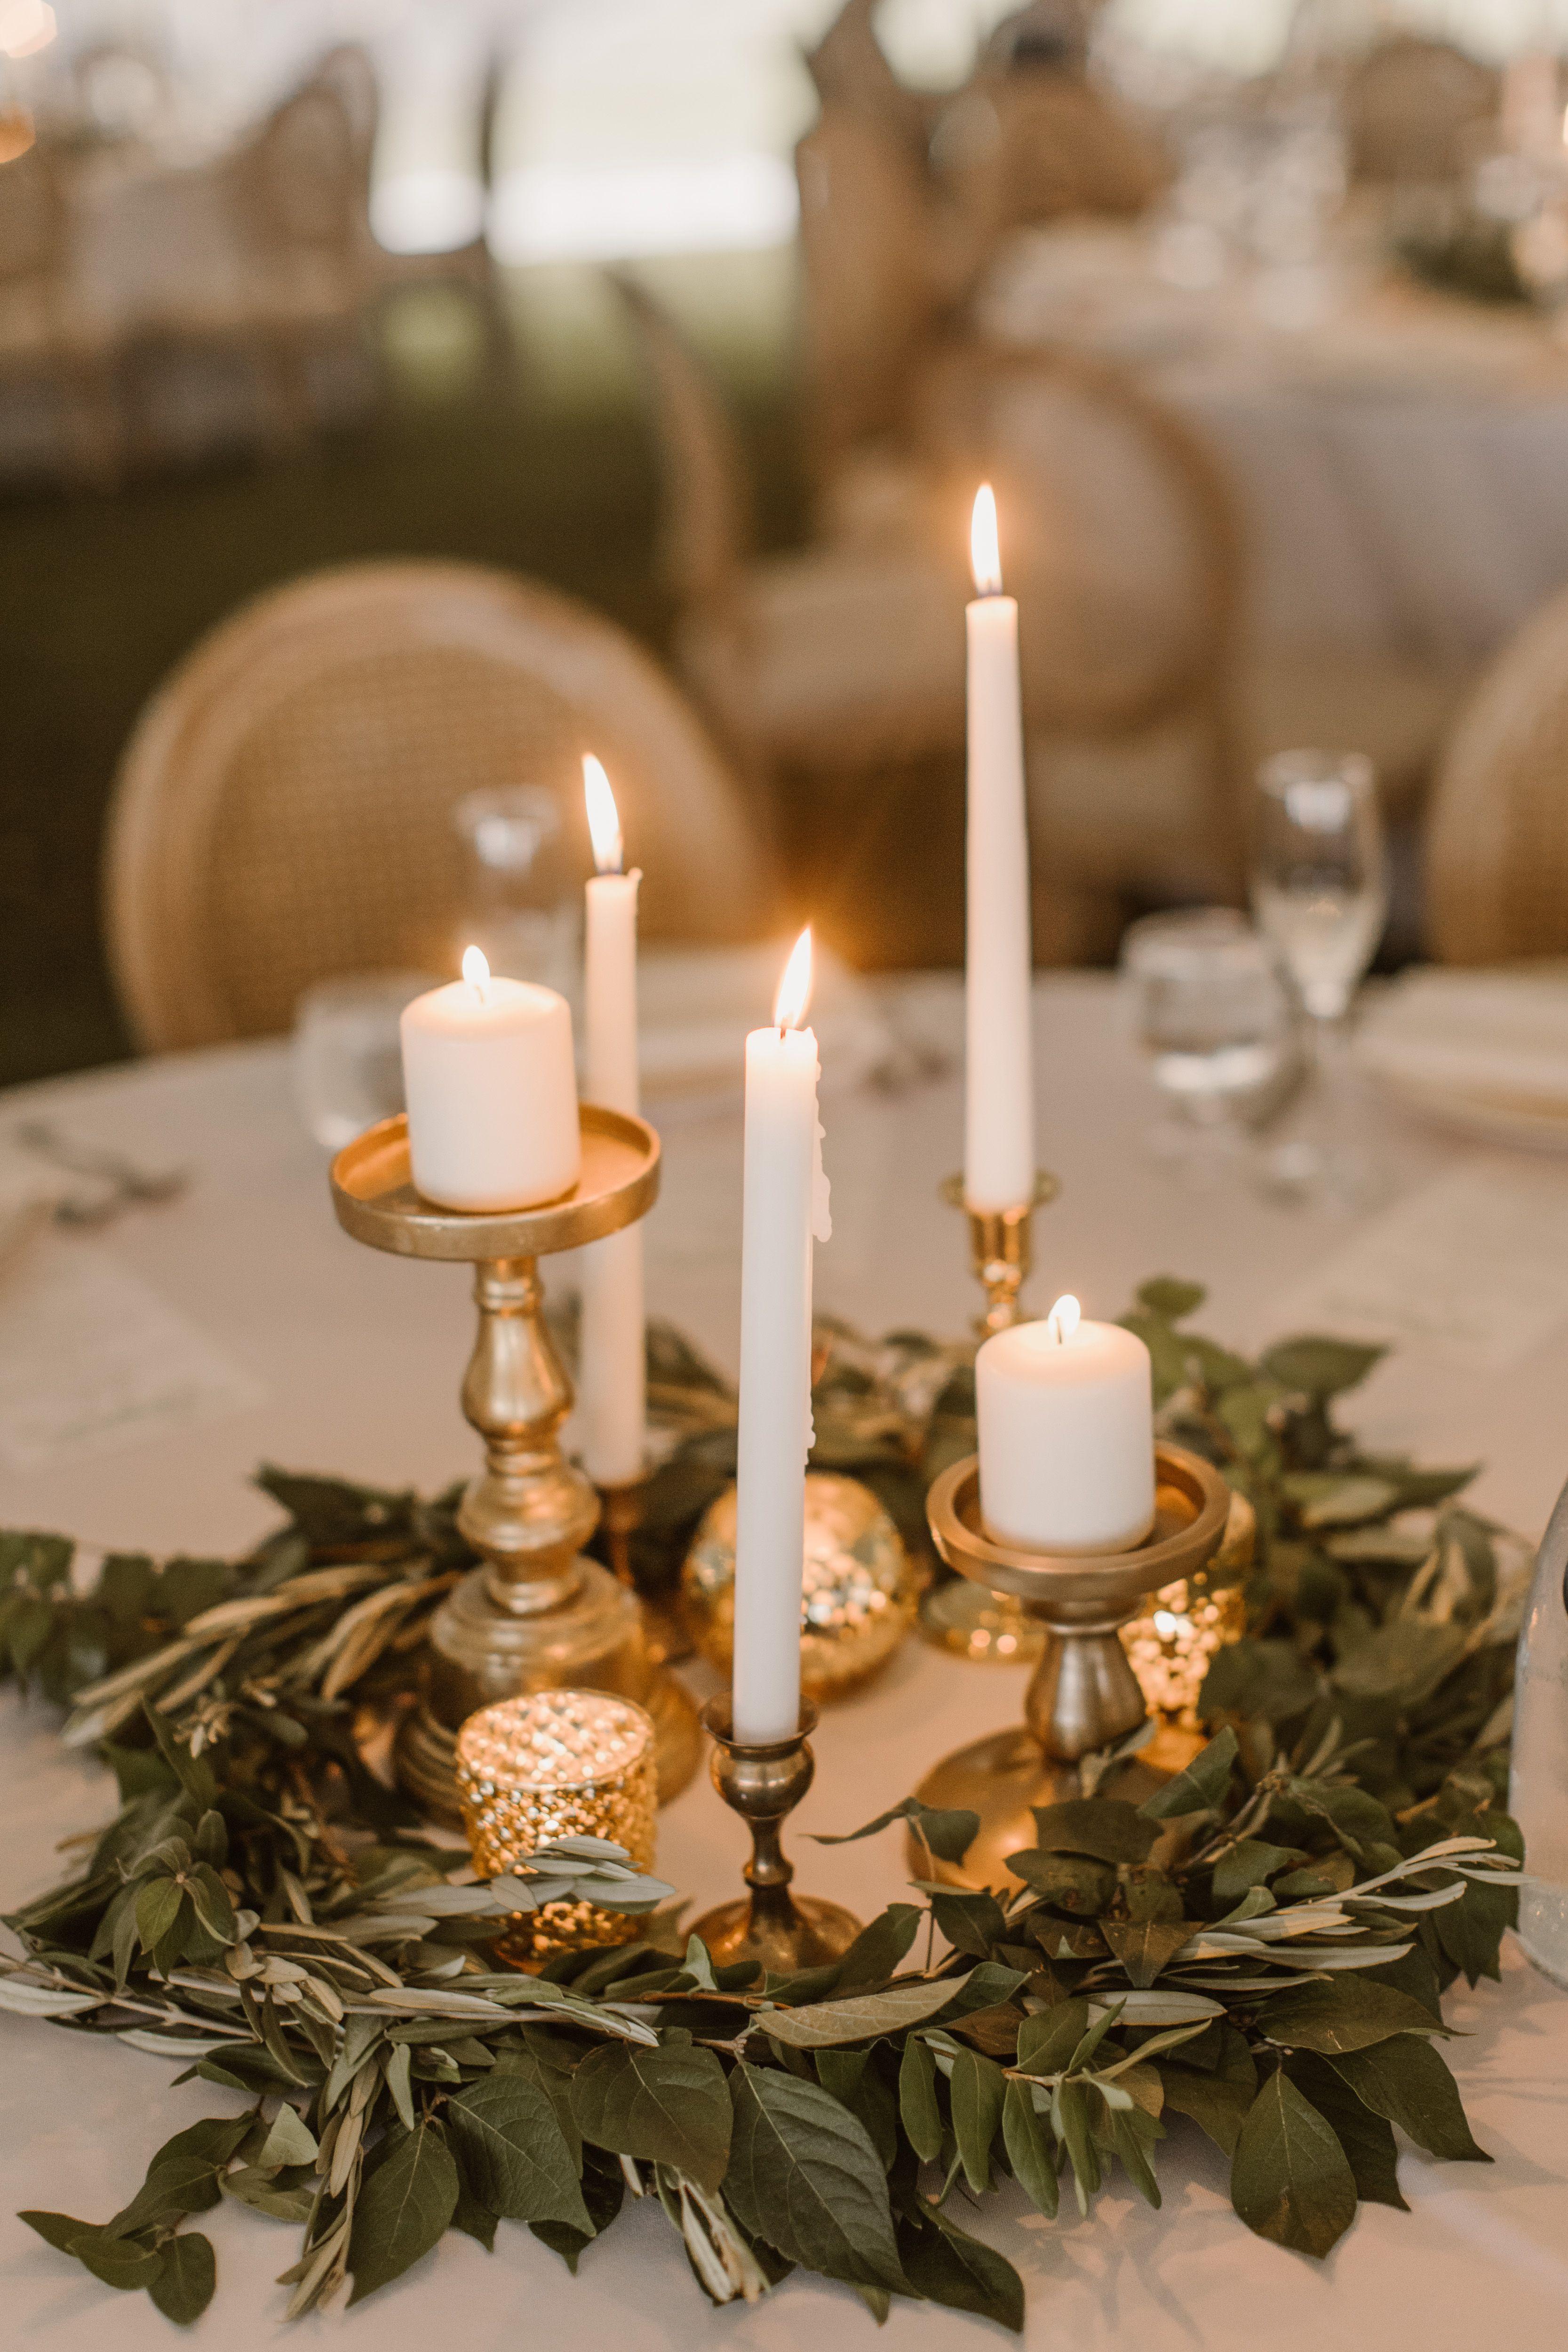 Wedding Lighting Inspiration Rentals White Glove Rentals Ft Brass Candlest Candlestick Centerpiece Wedding Wedding Lights Cheap Wedding Table Centerpieces